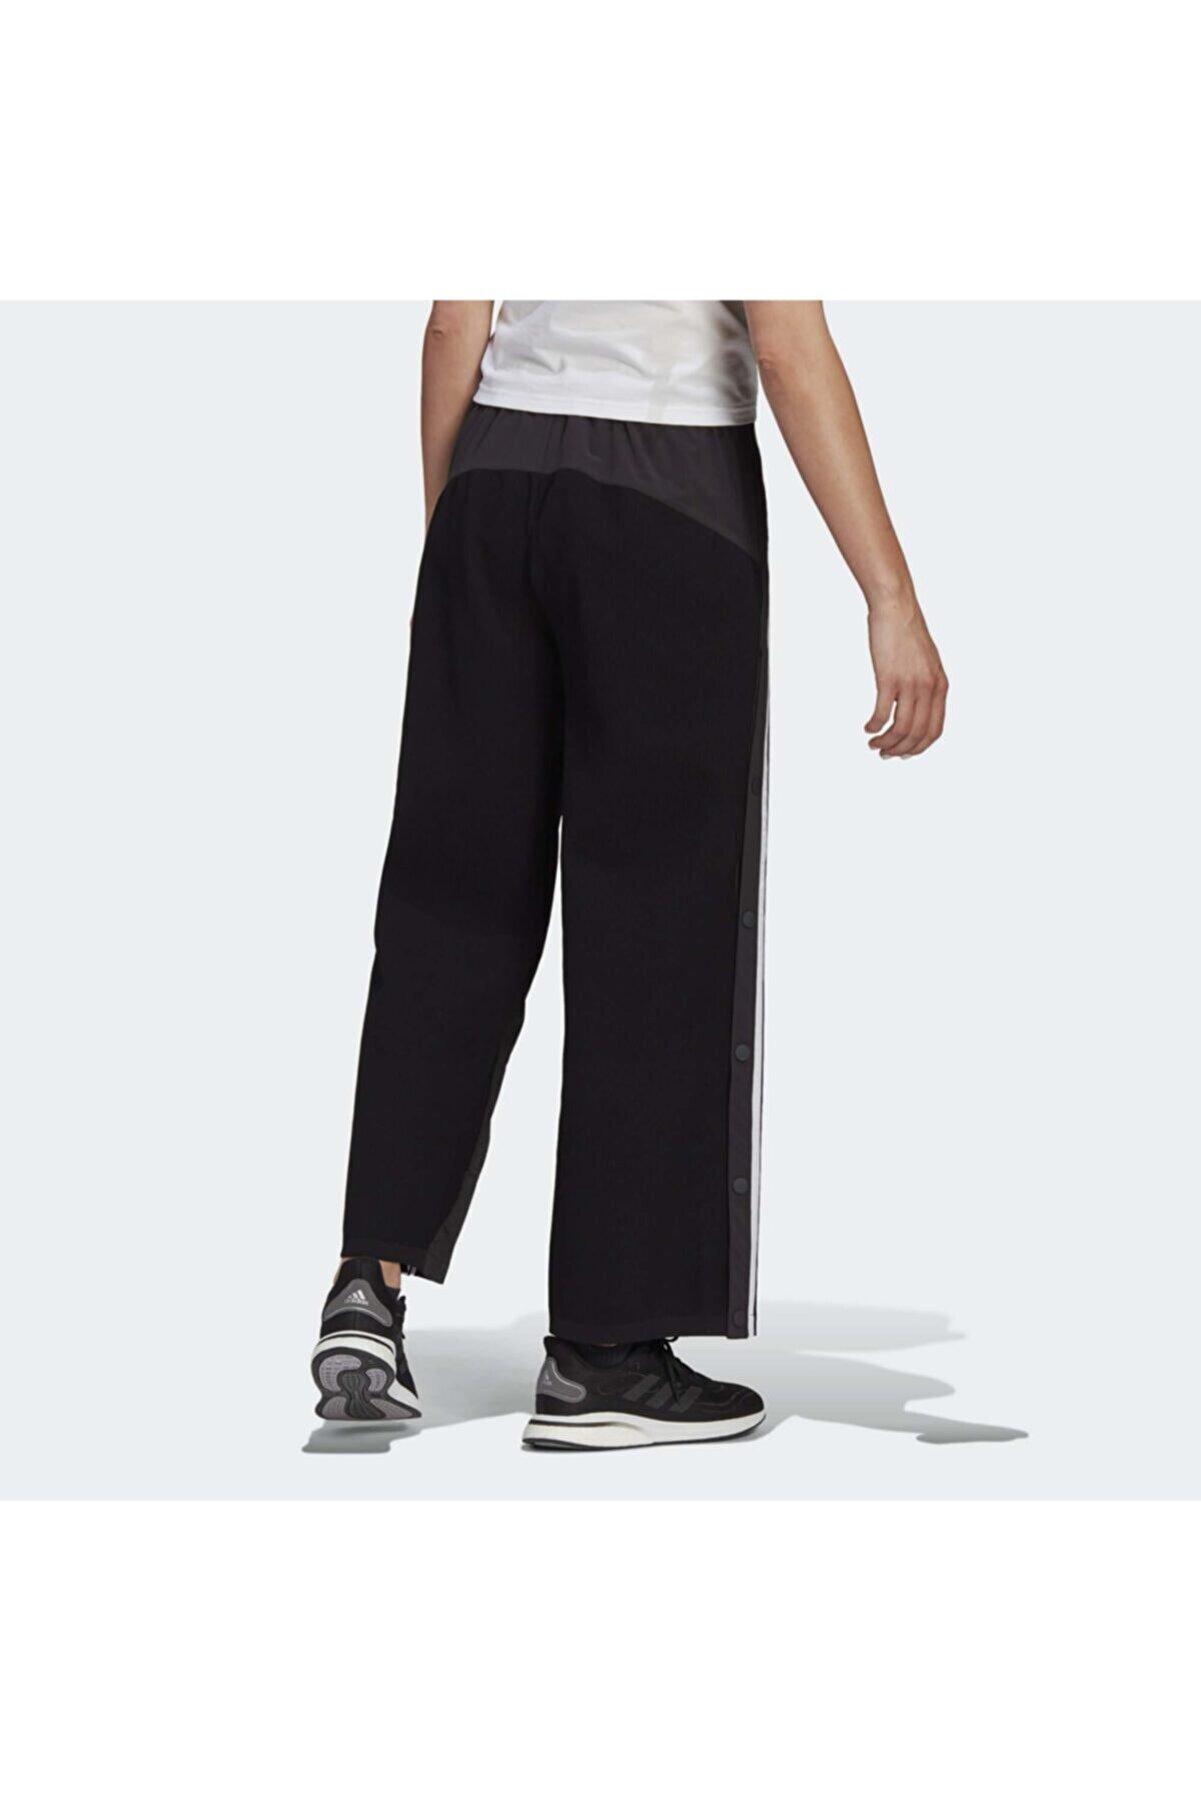 adidas W Aekn Snp Pnt Kadın Antrenman Eşofman Altı Ge5490 Siyah